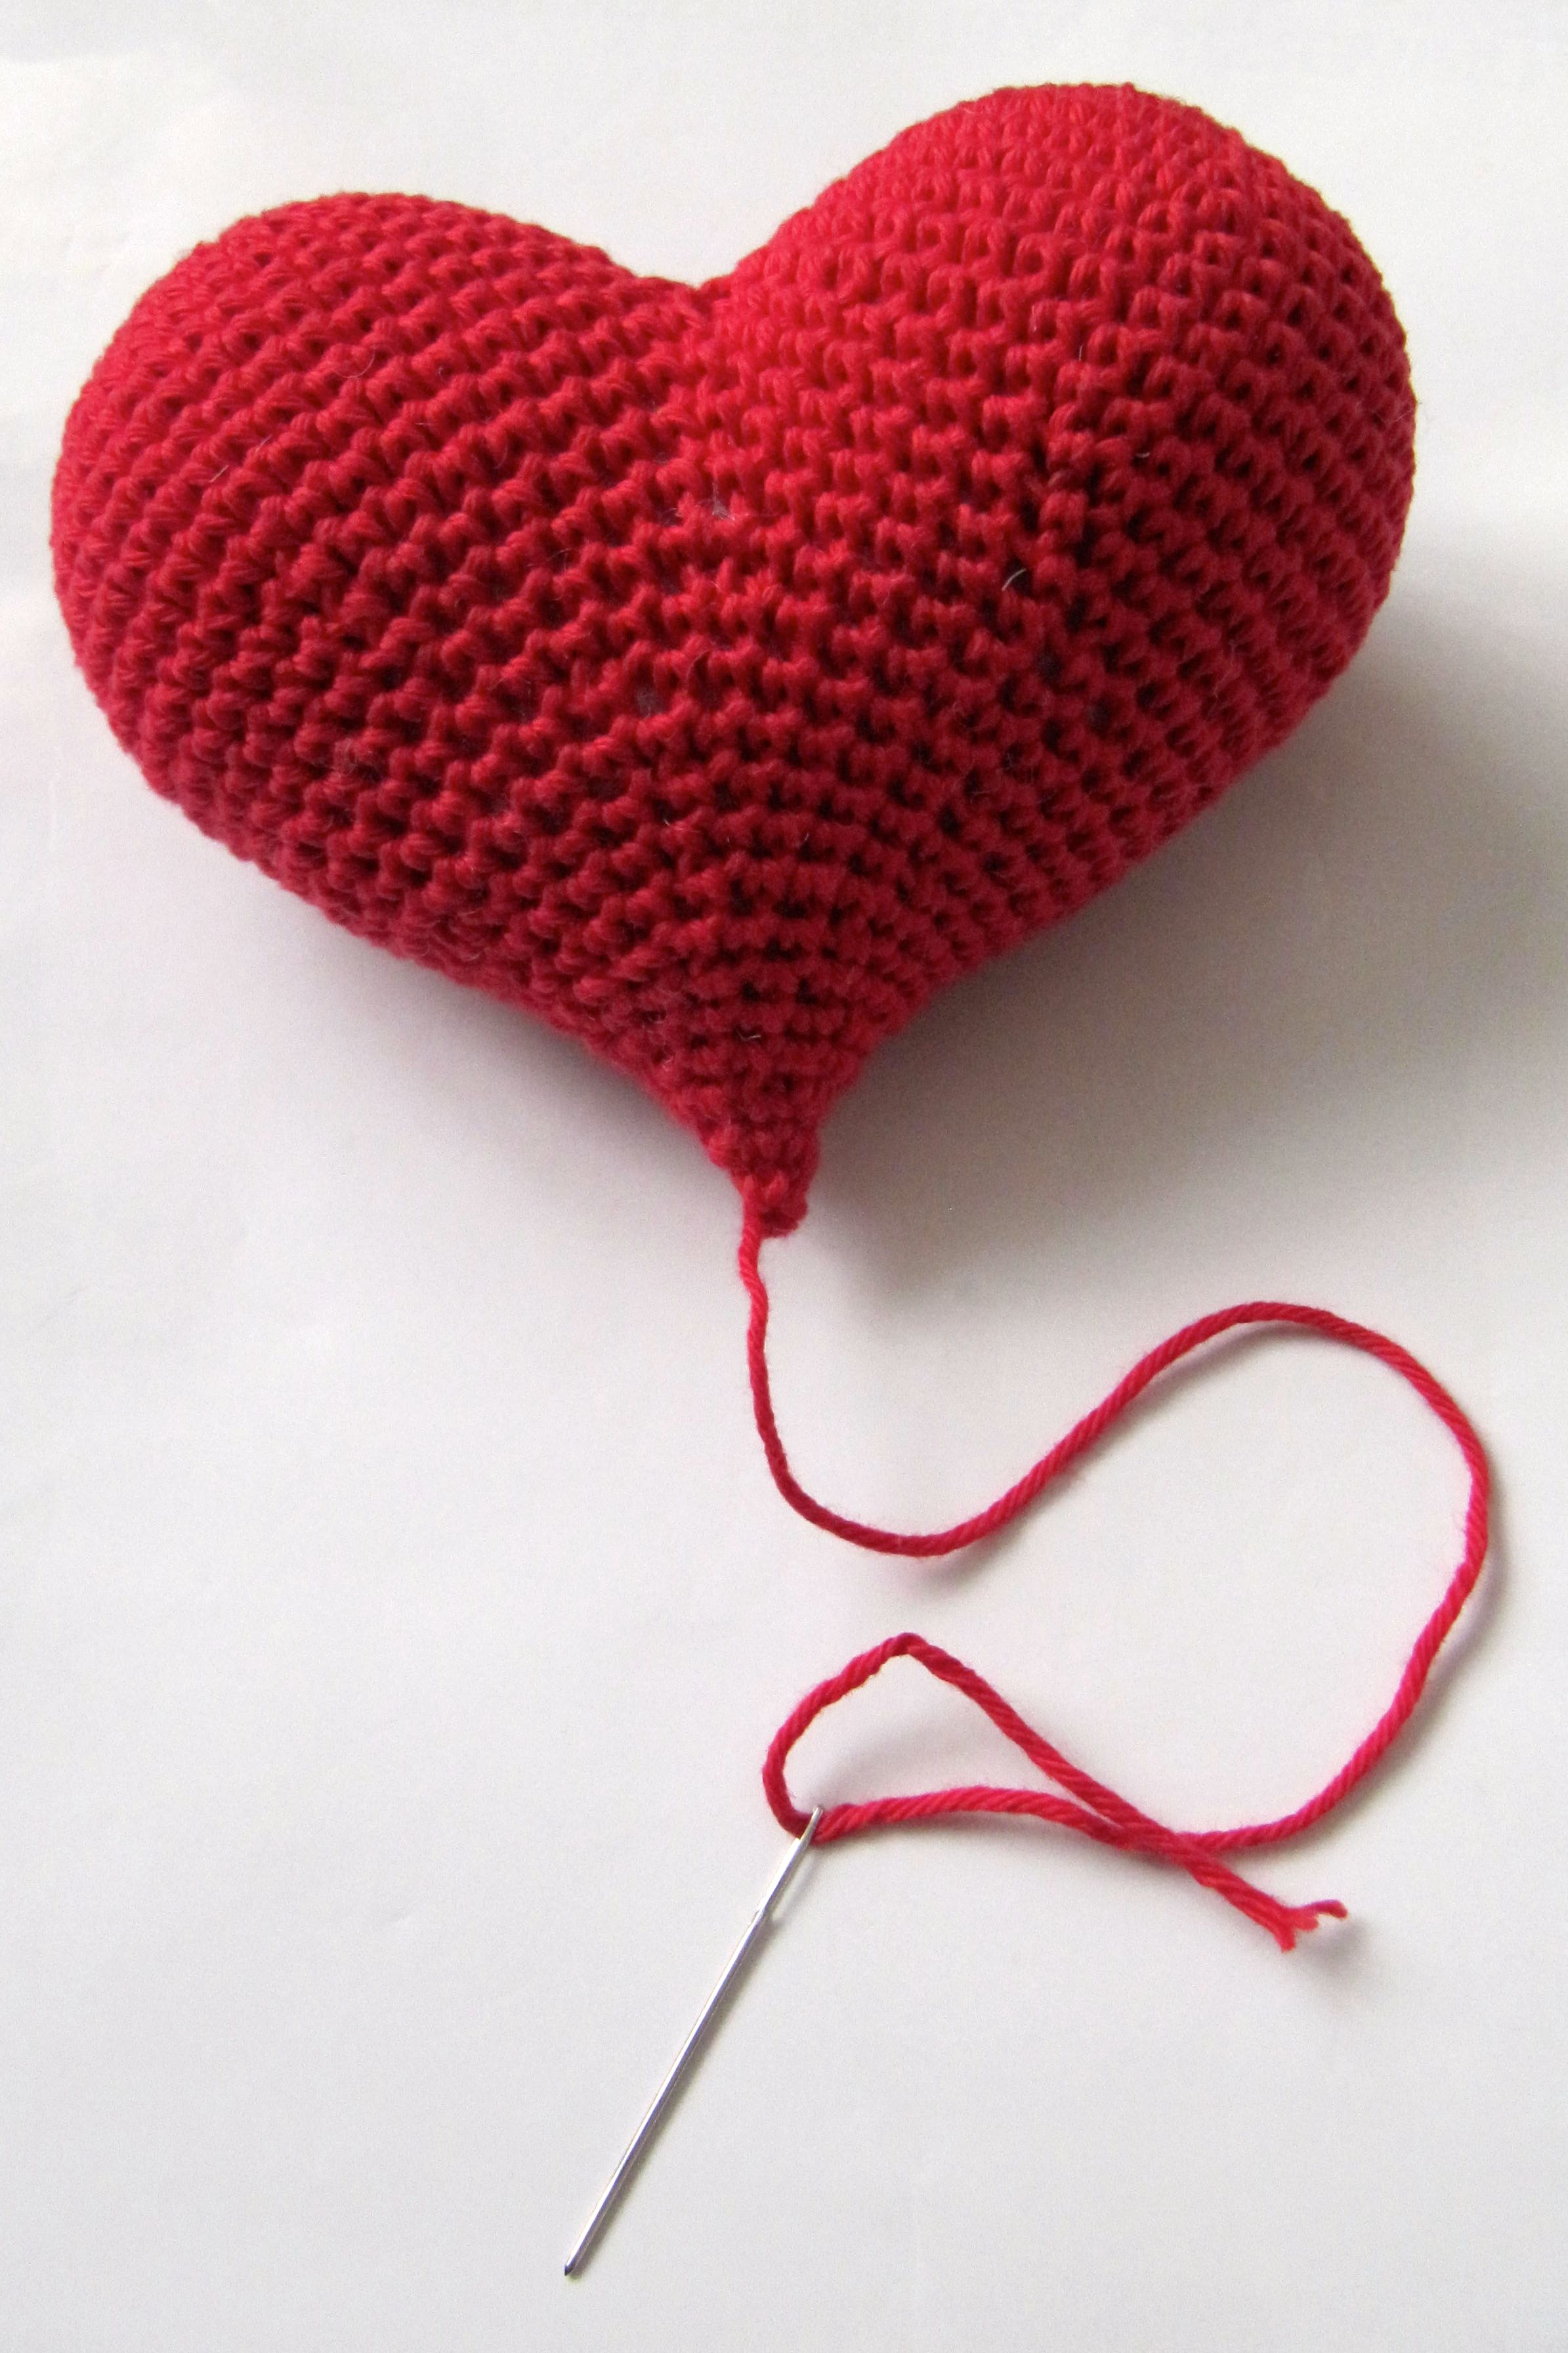 Herz Häkeln Anleitung Häkeln Crochet Crochet Home Und Crochet